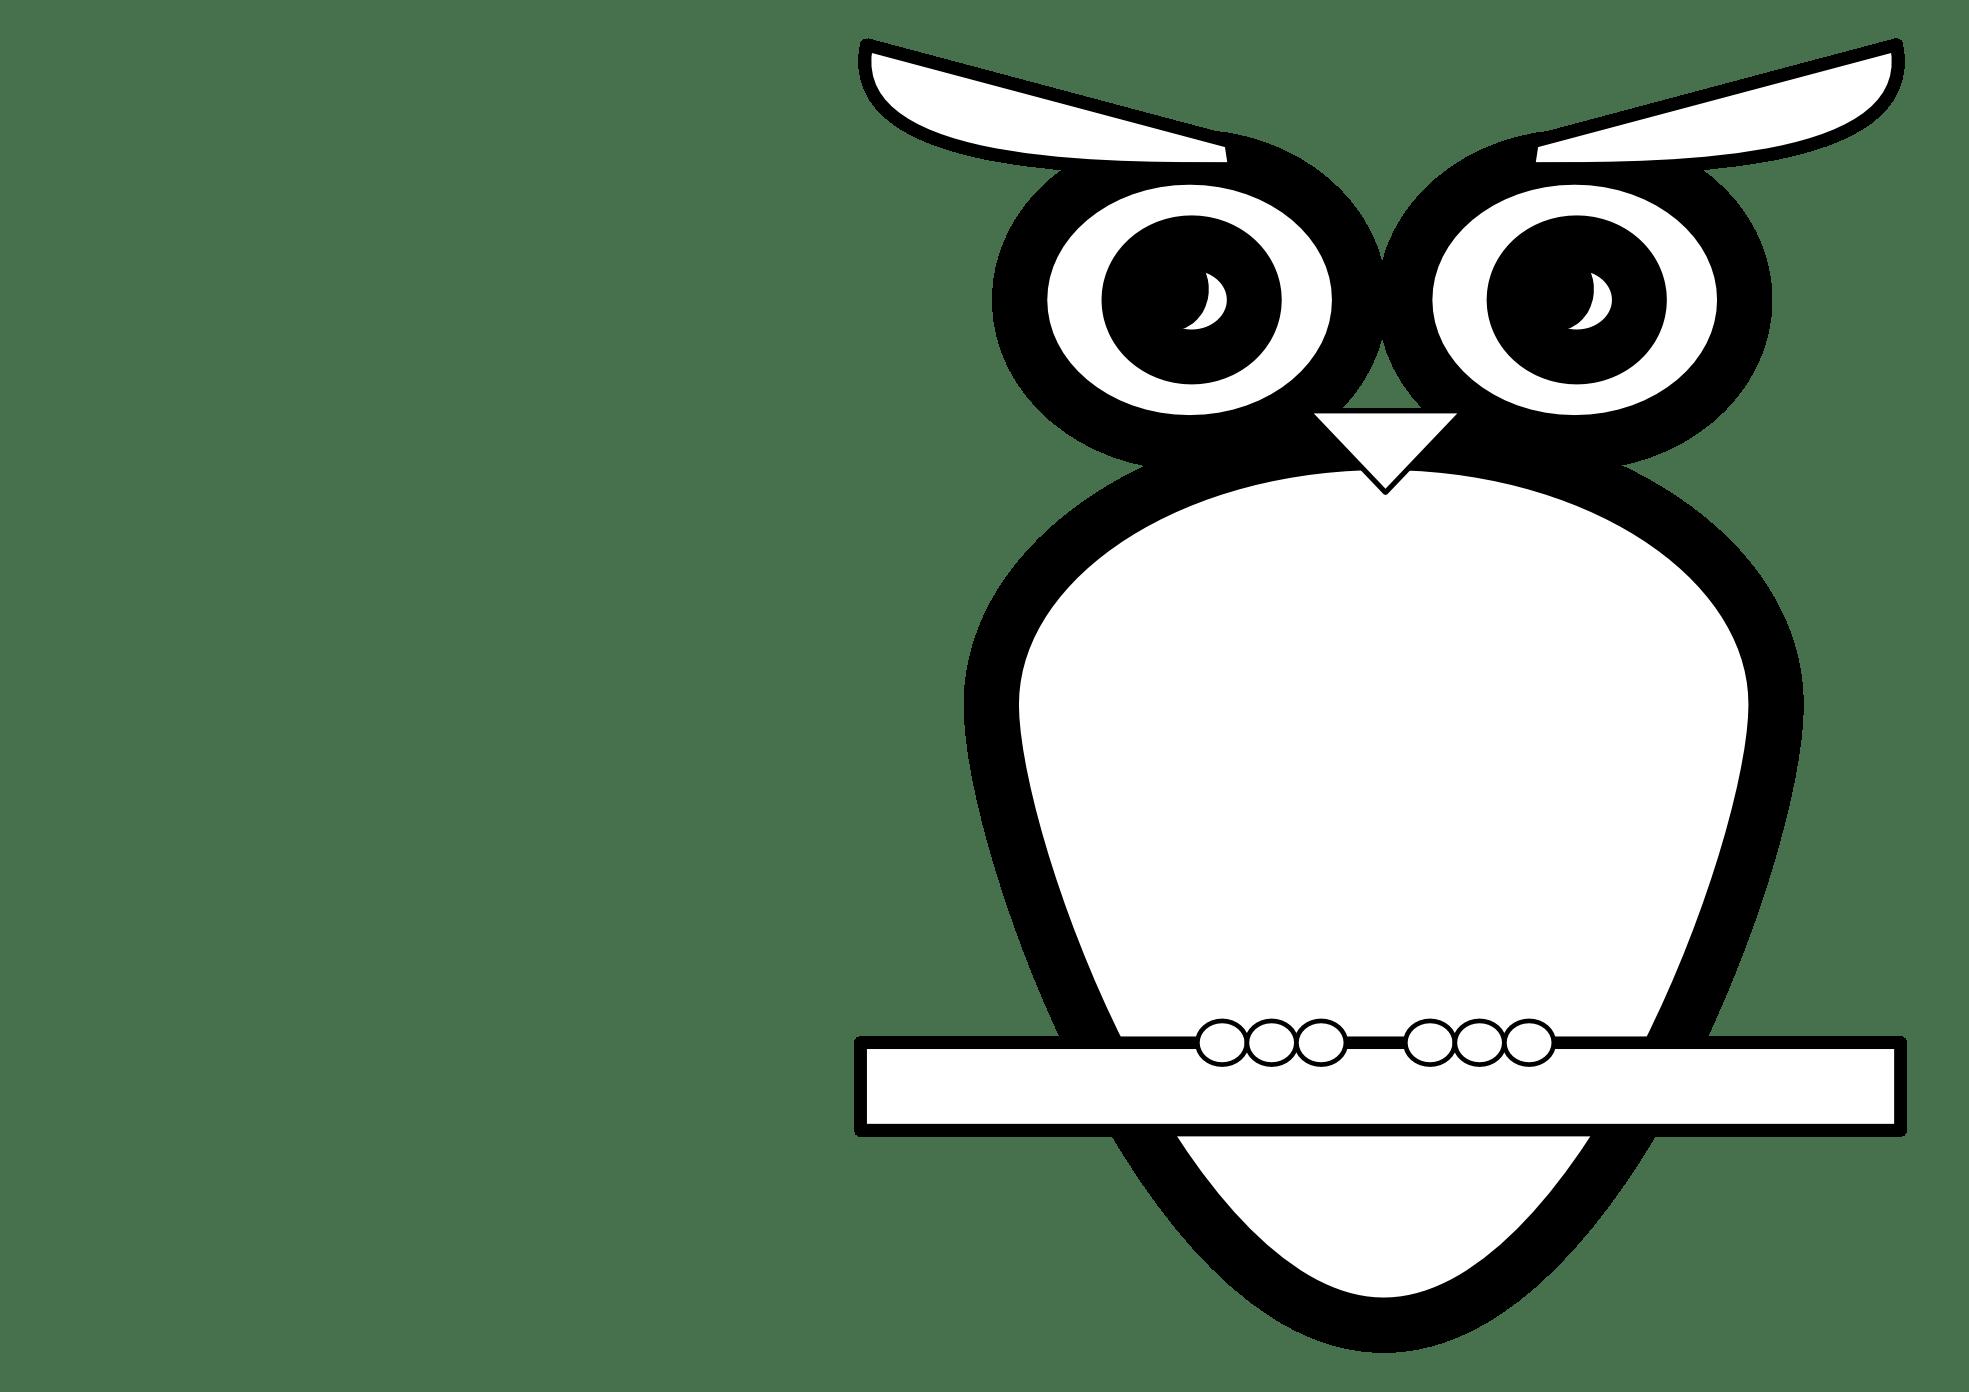 Clipart Of An Owl